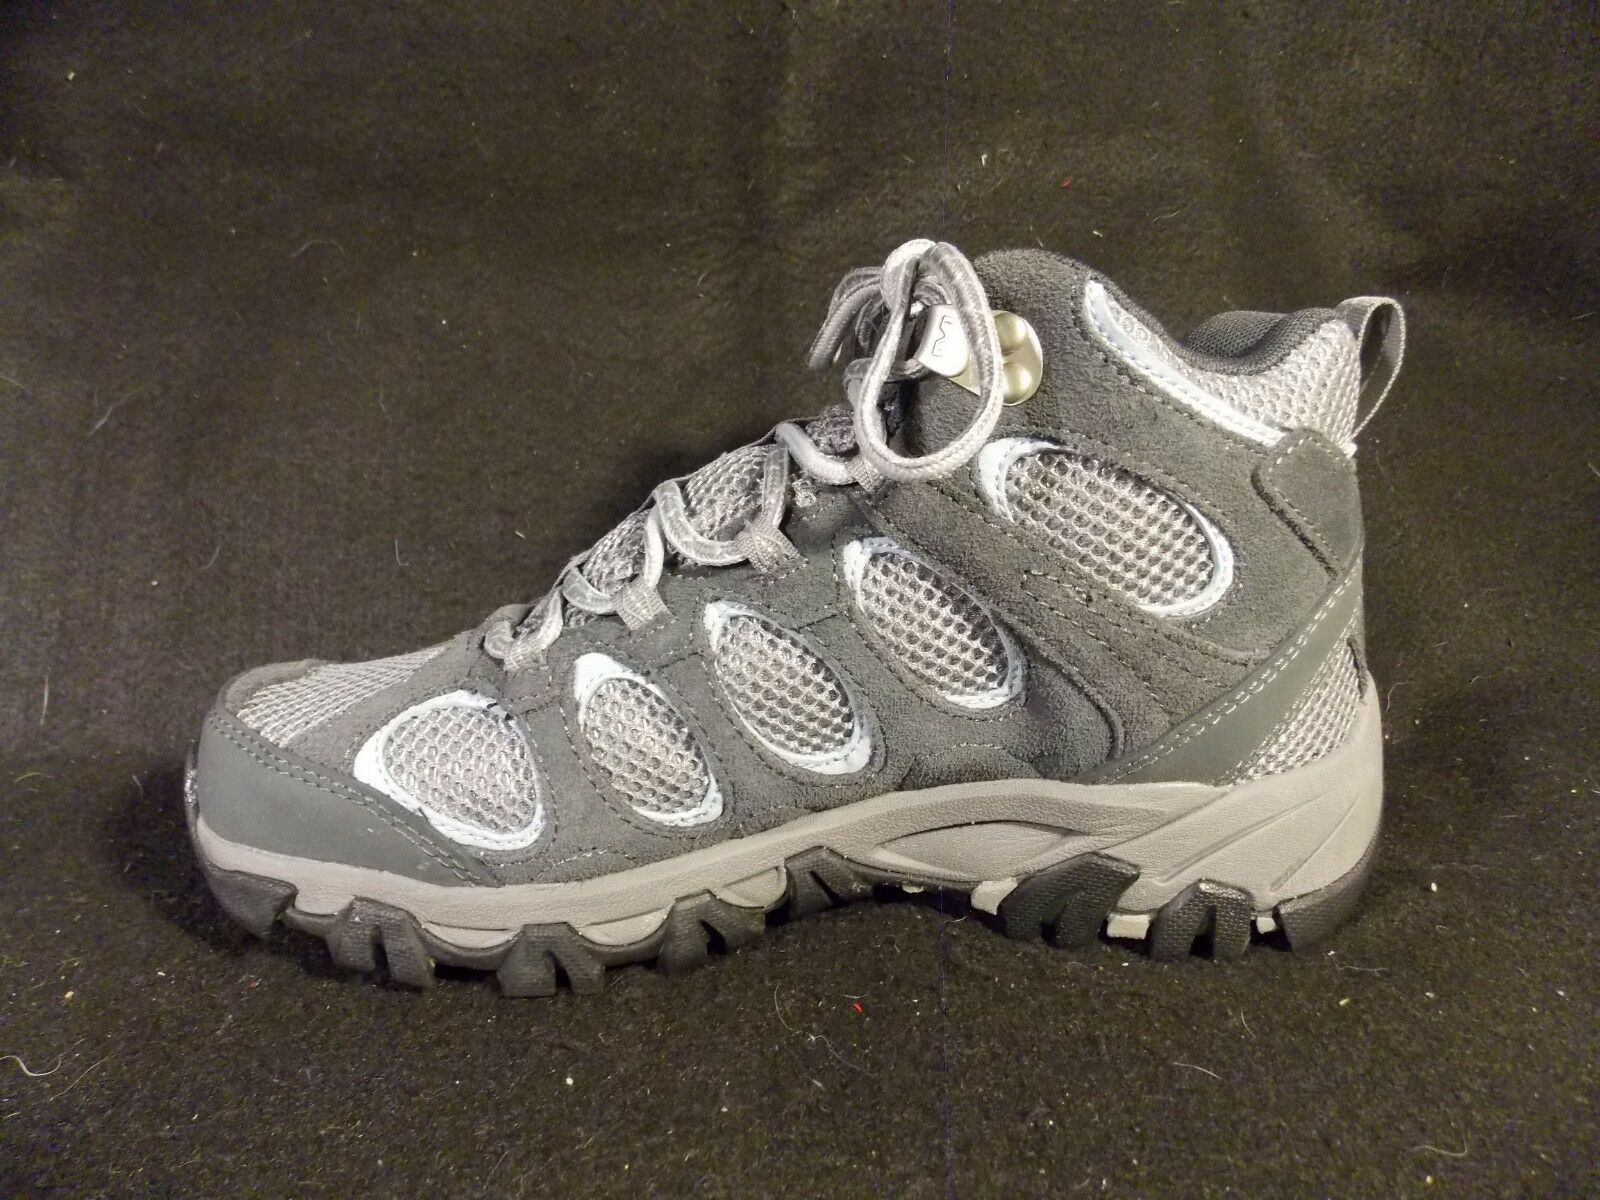 Women's Merrell Hilltop Vent Waterproof Castle Rock Gray Hiking Shoes Size 6 image 5